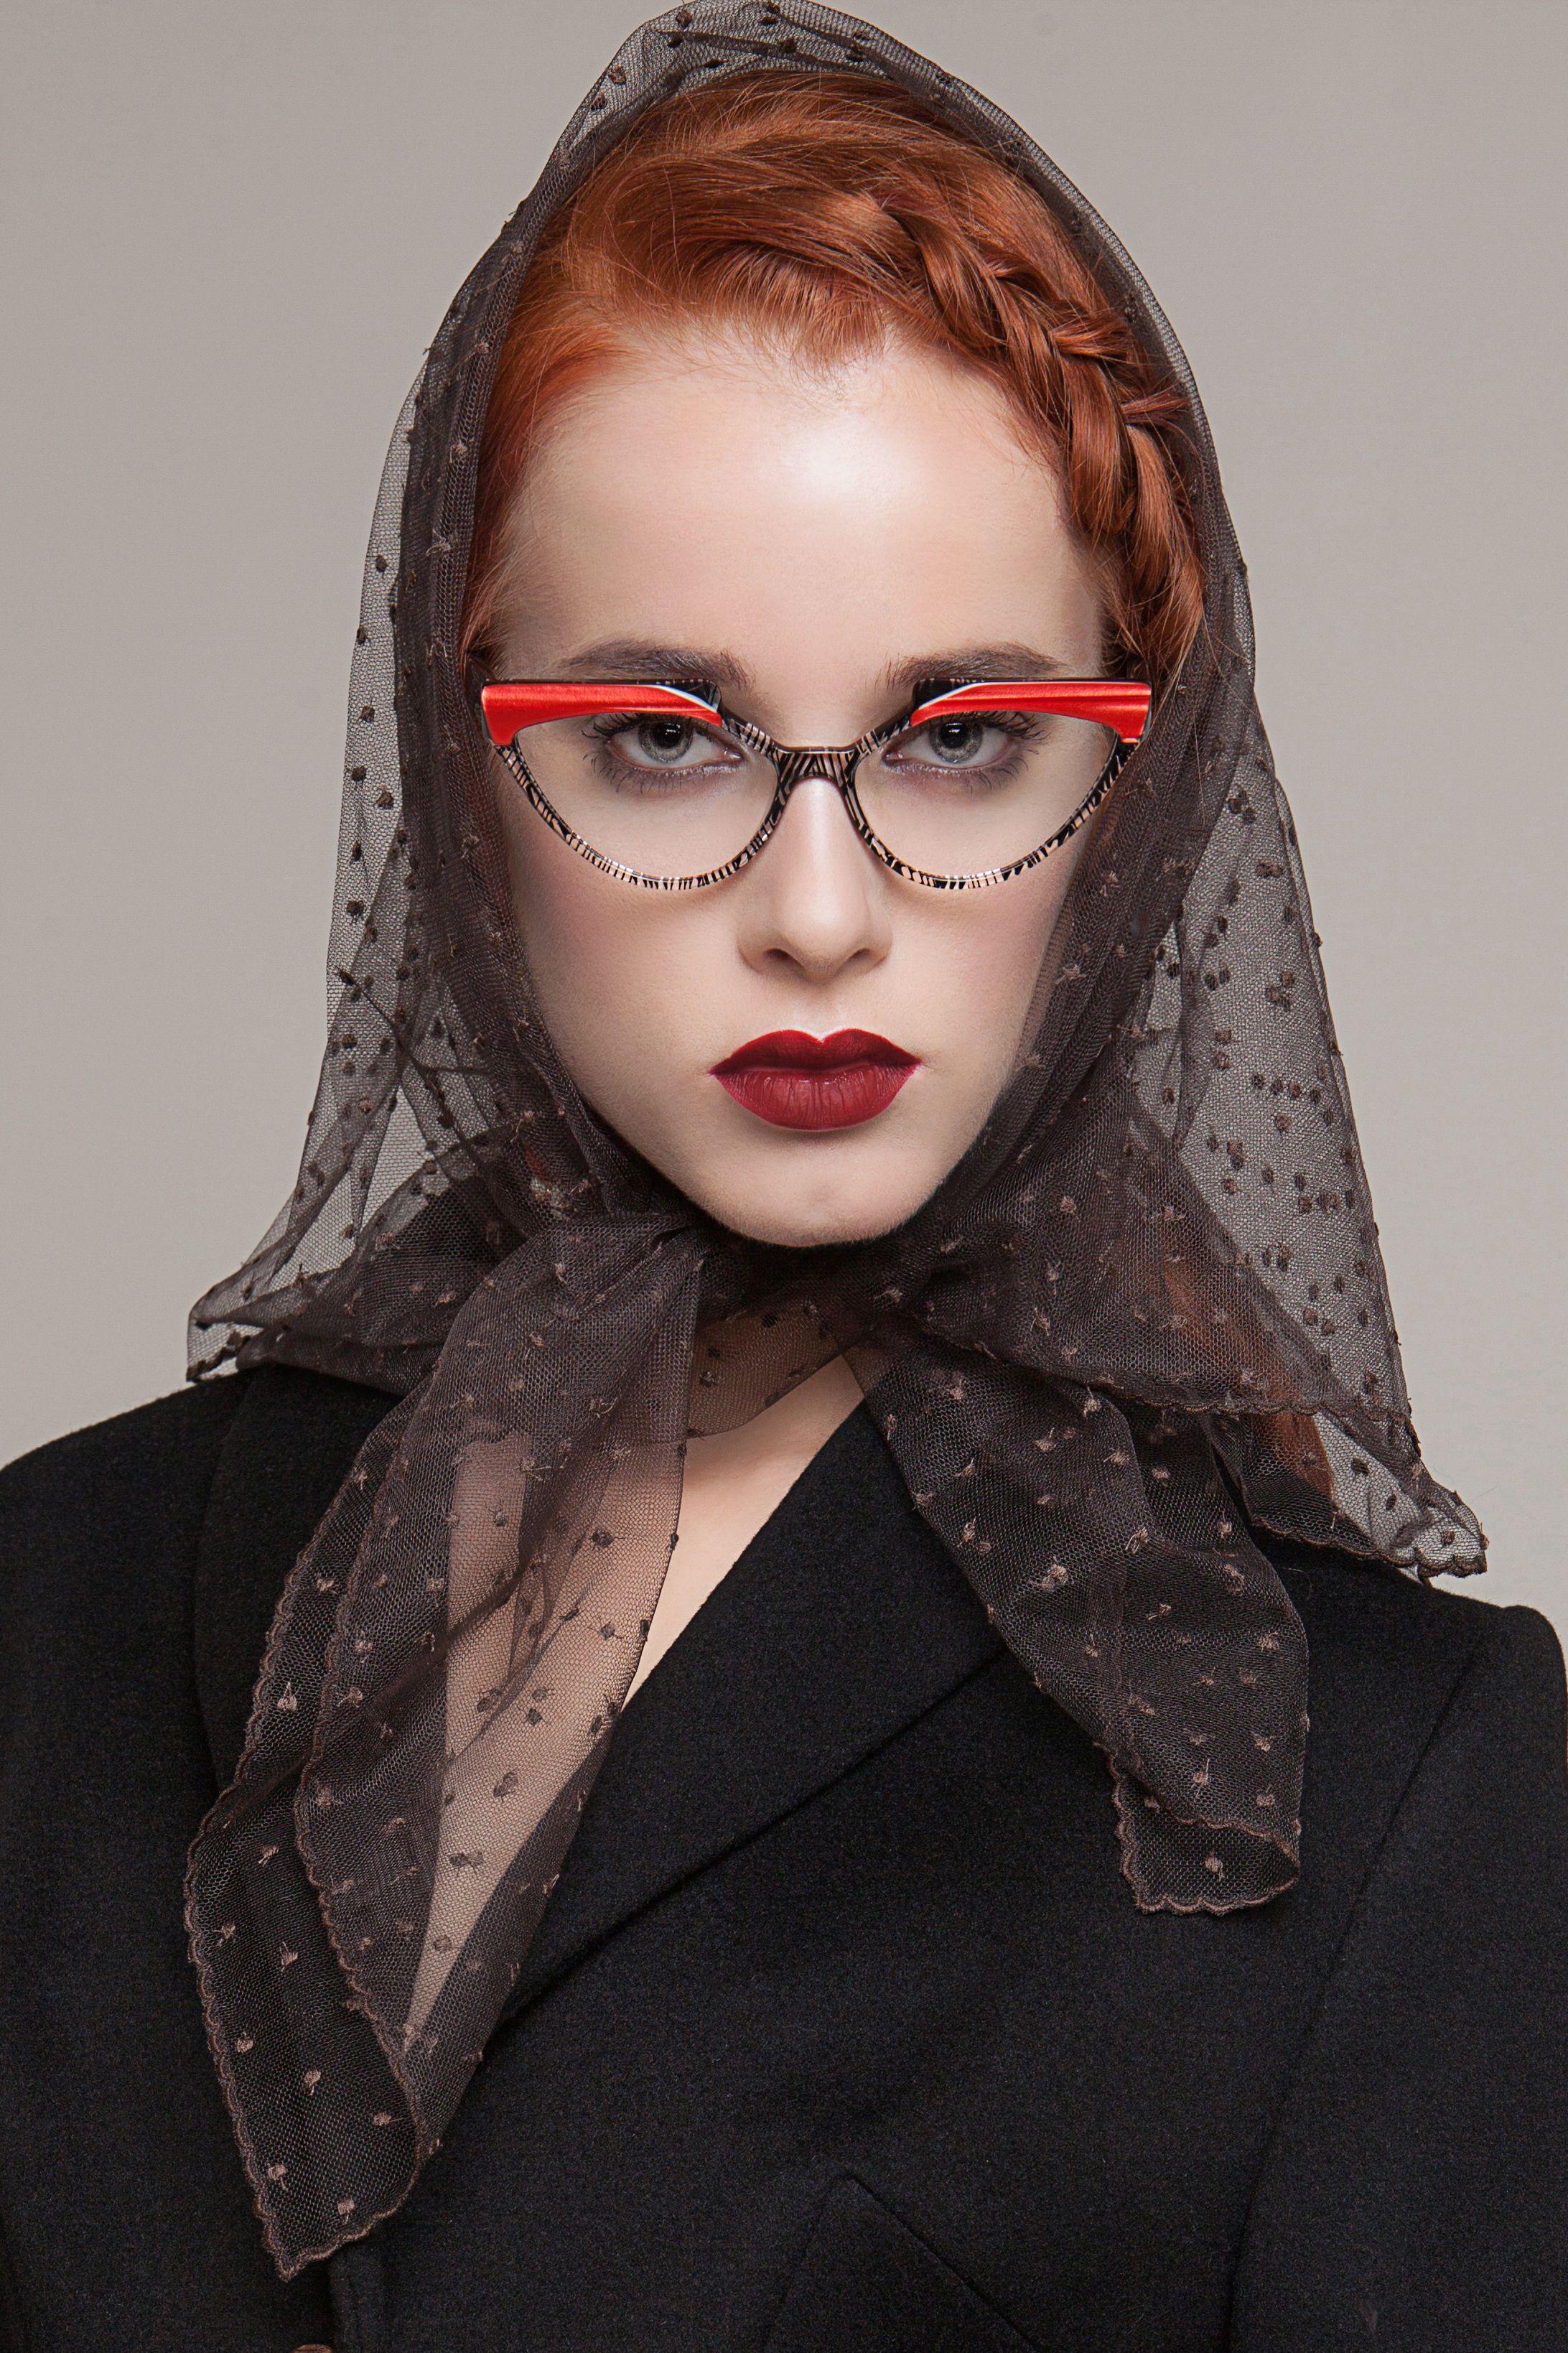 Pin von The Optical at 50th & France auf Eyeglasses | Pinterest